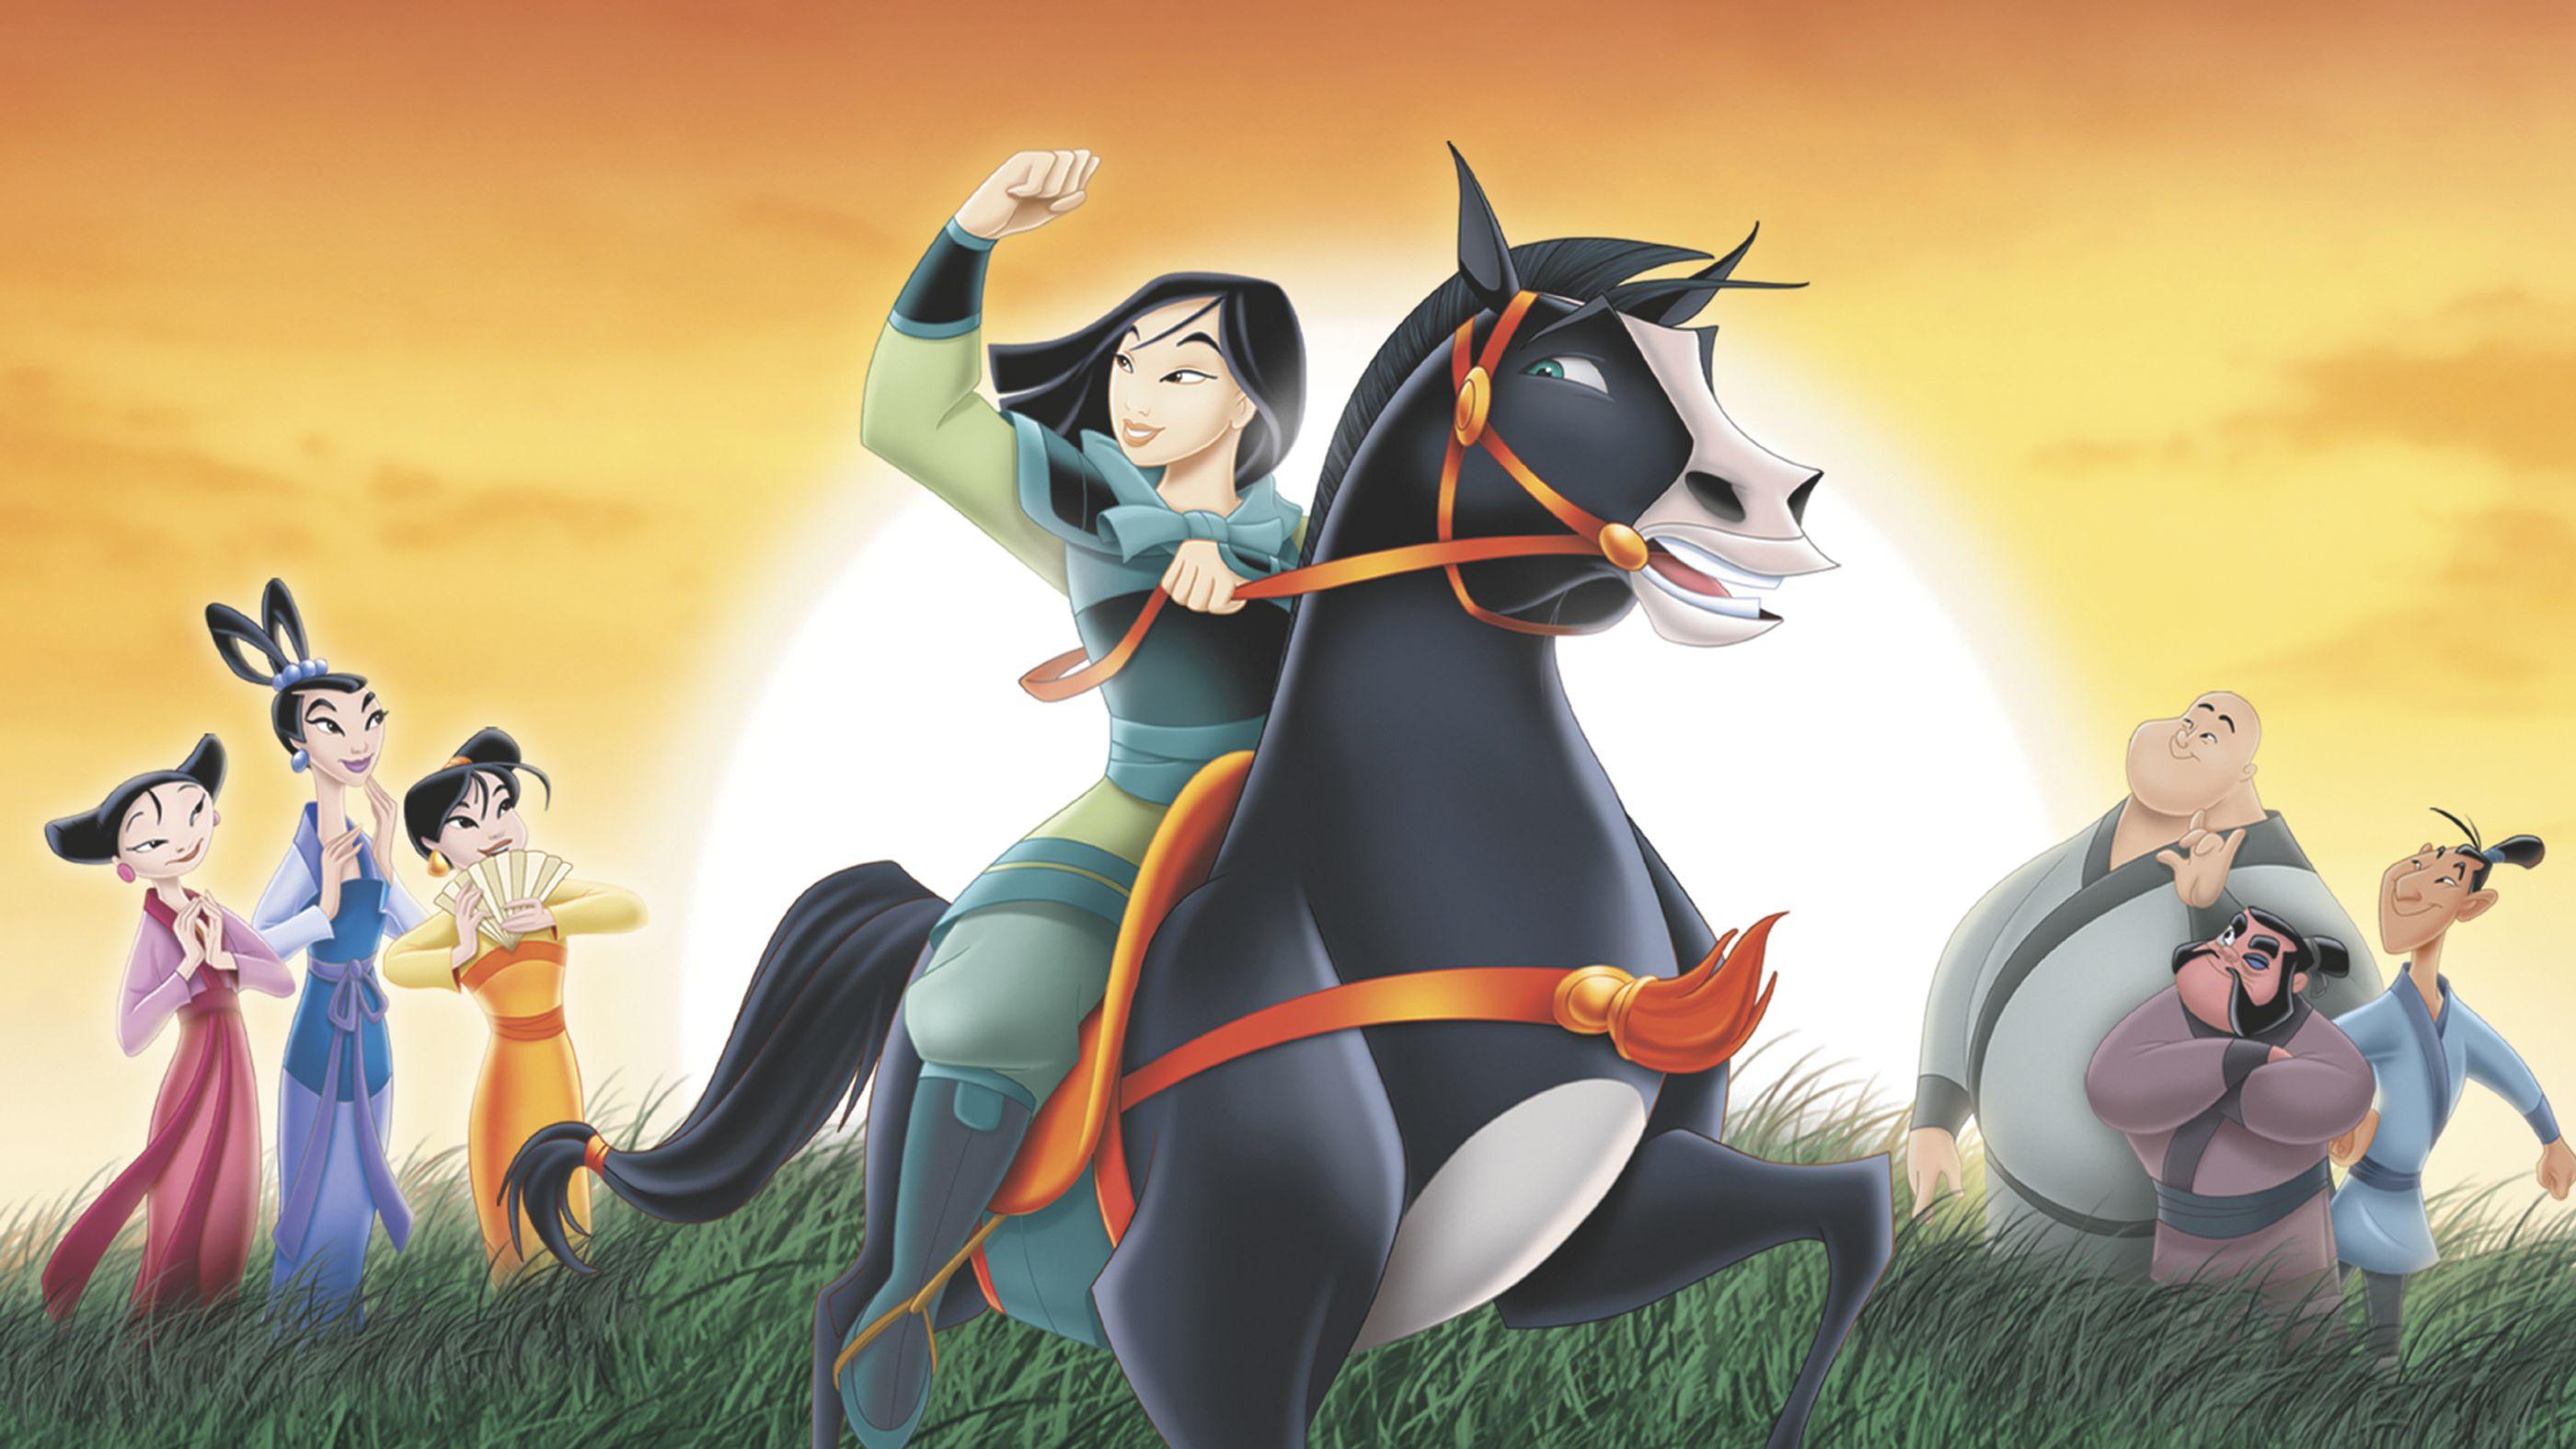 mulan movie download in hindi dubbed